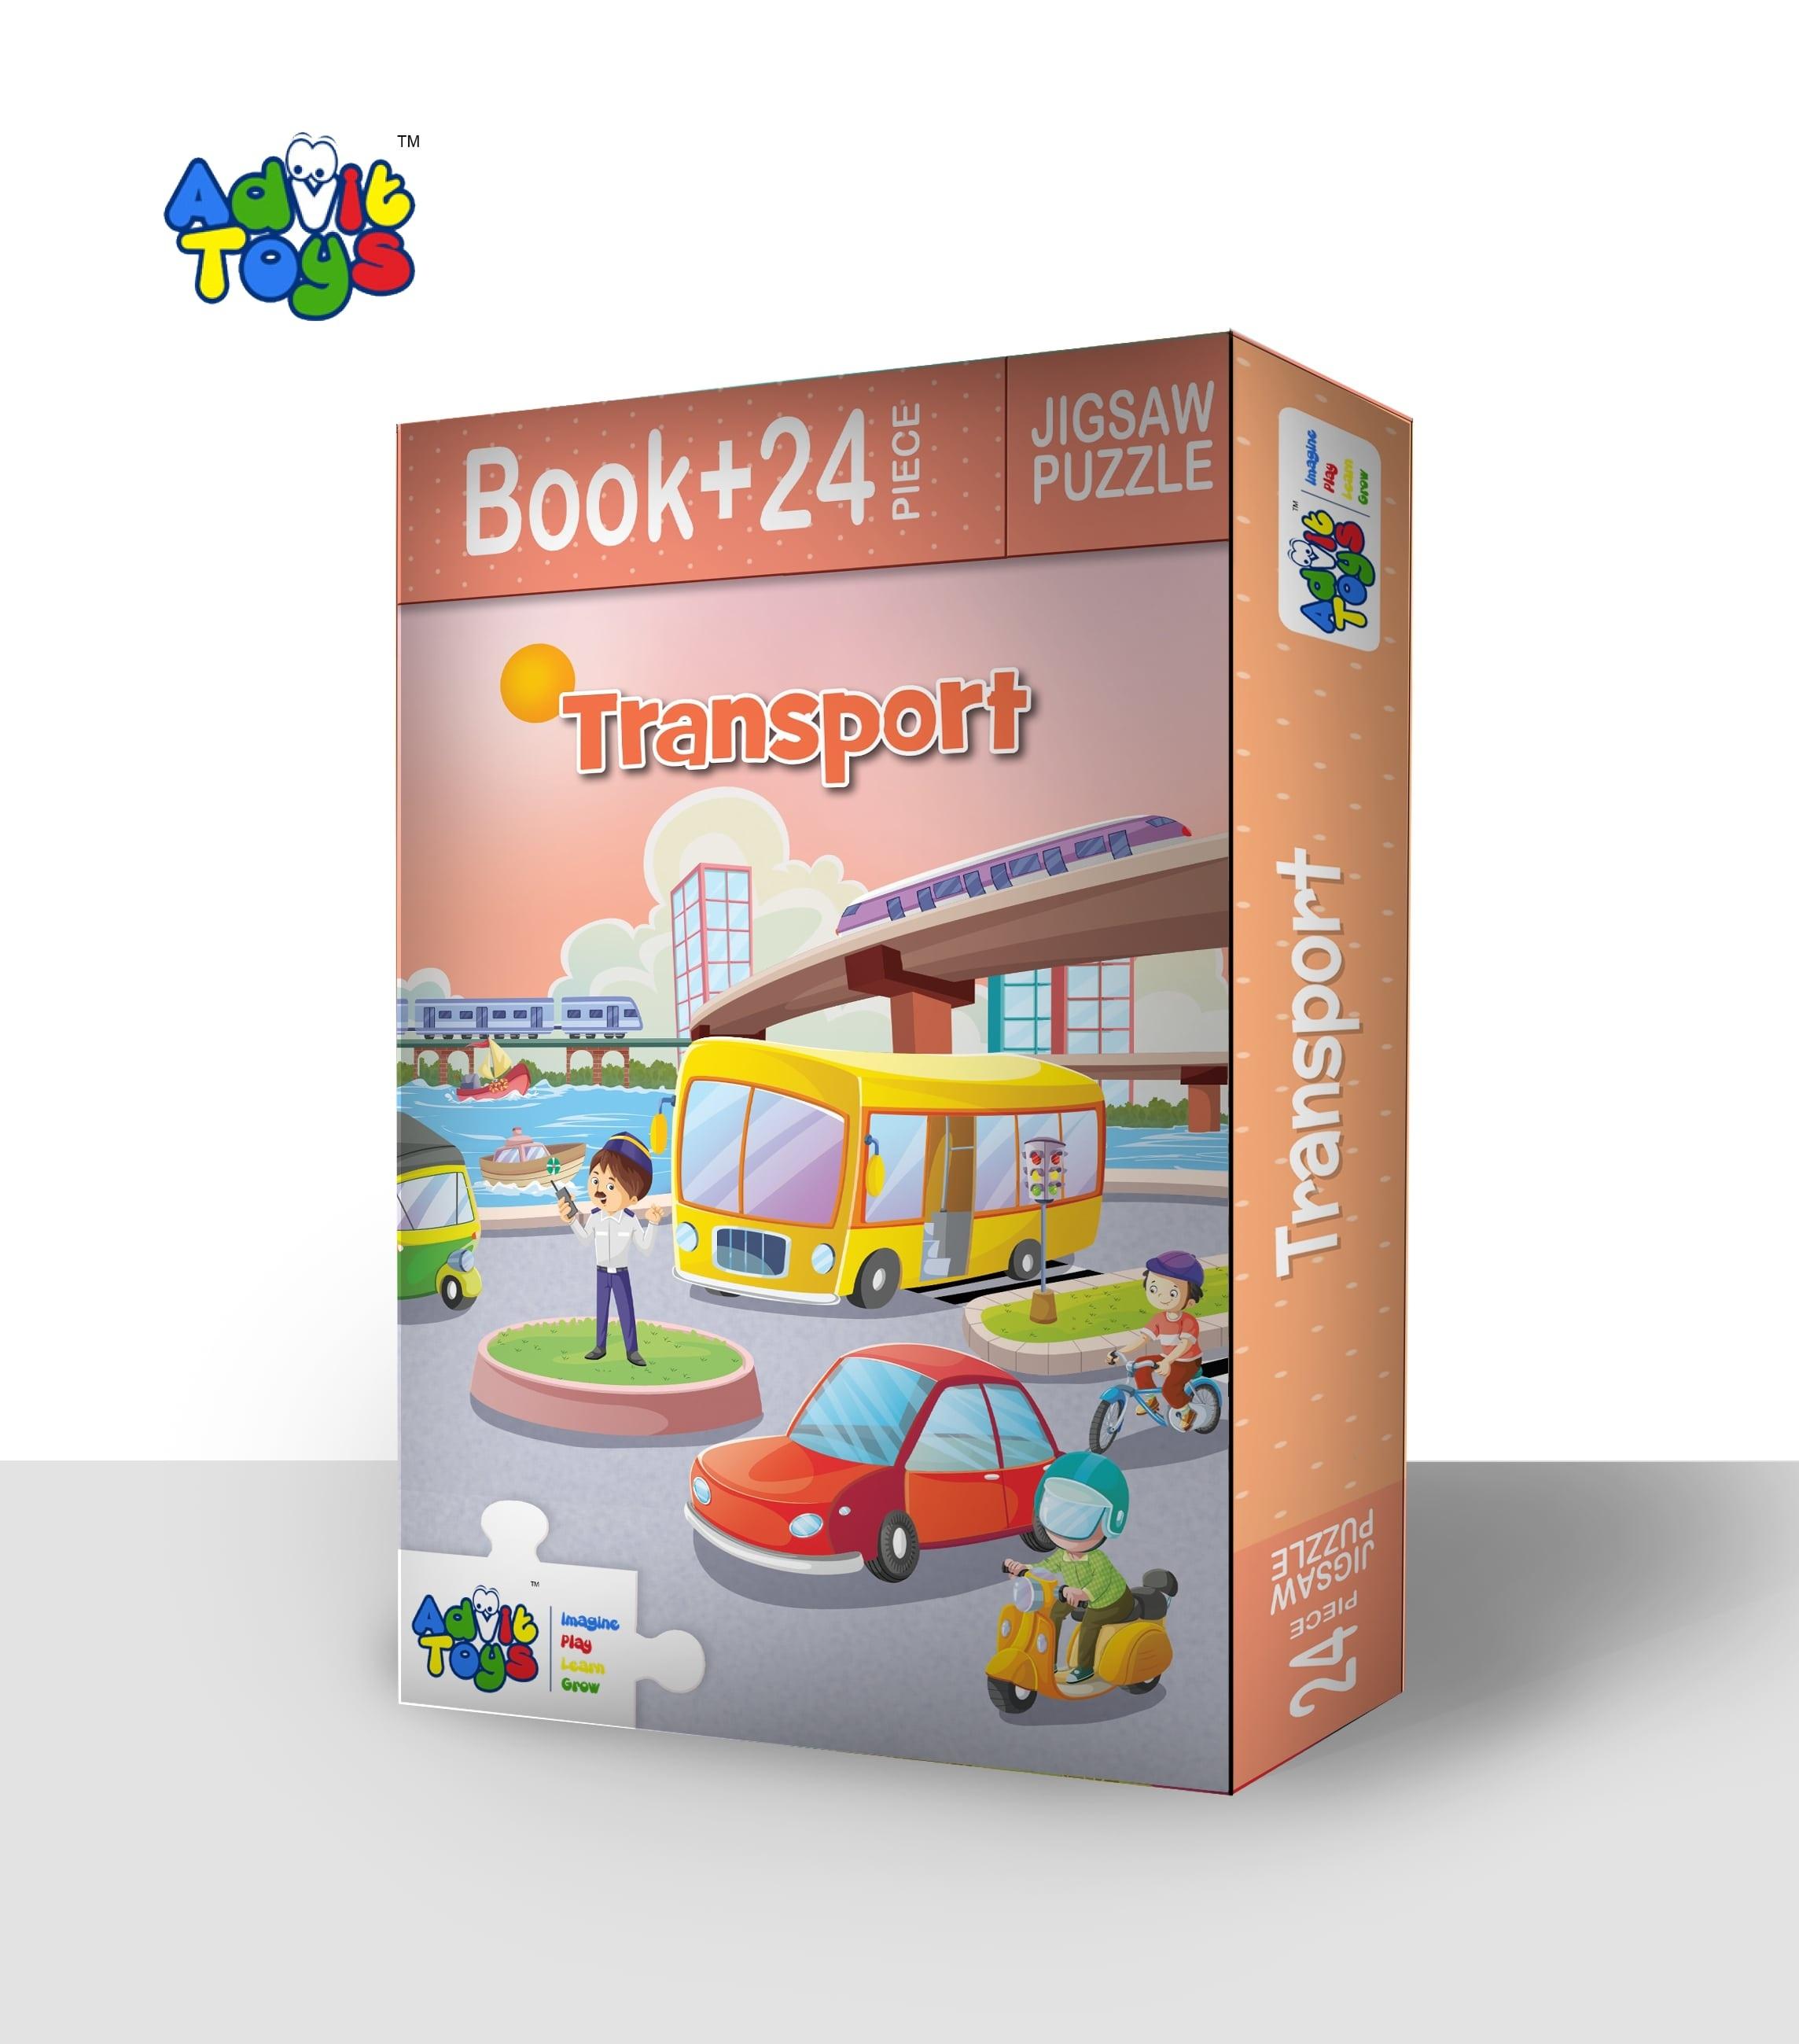 Transport Jigsaw Puzzle ( Book + 24 Piece )